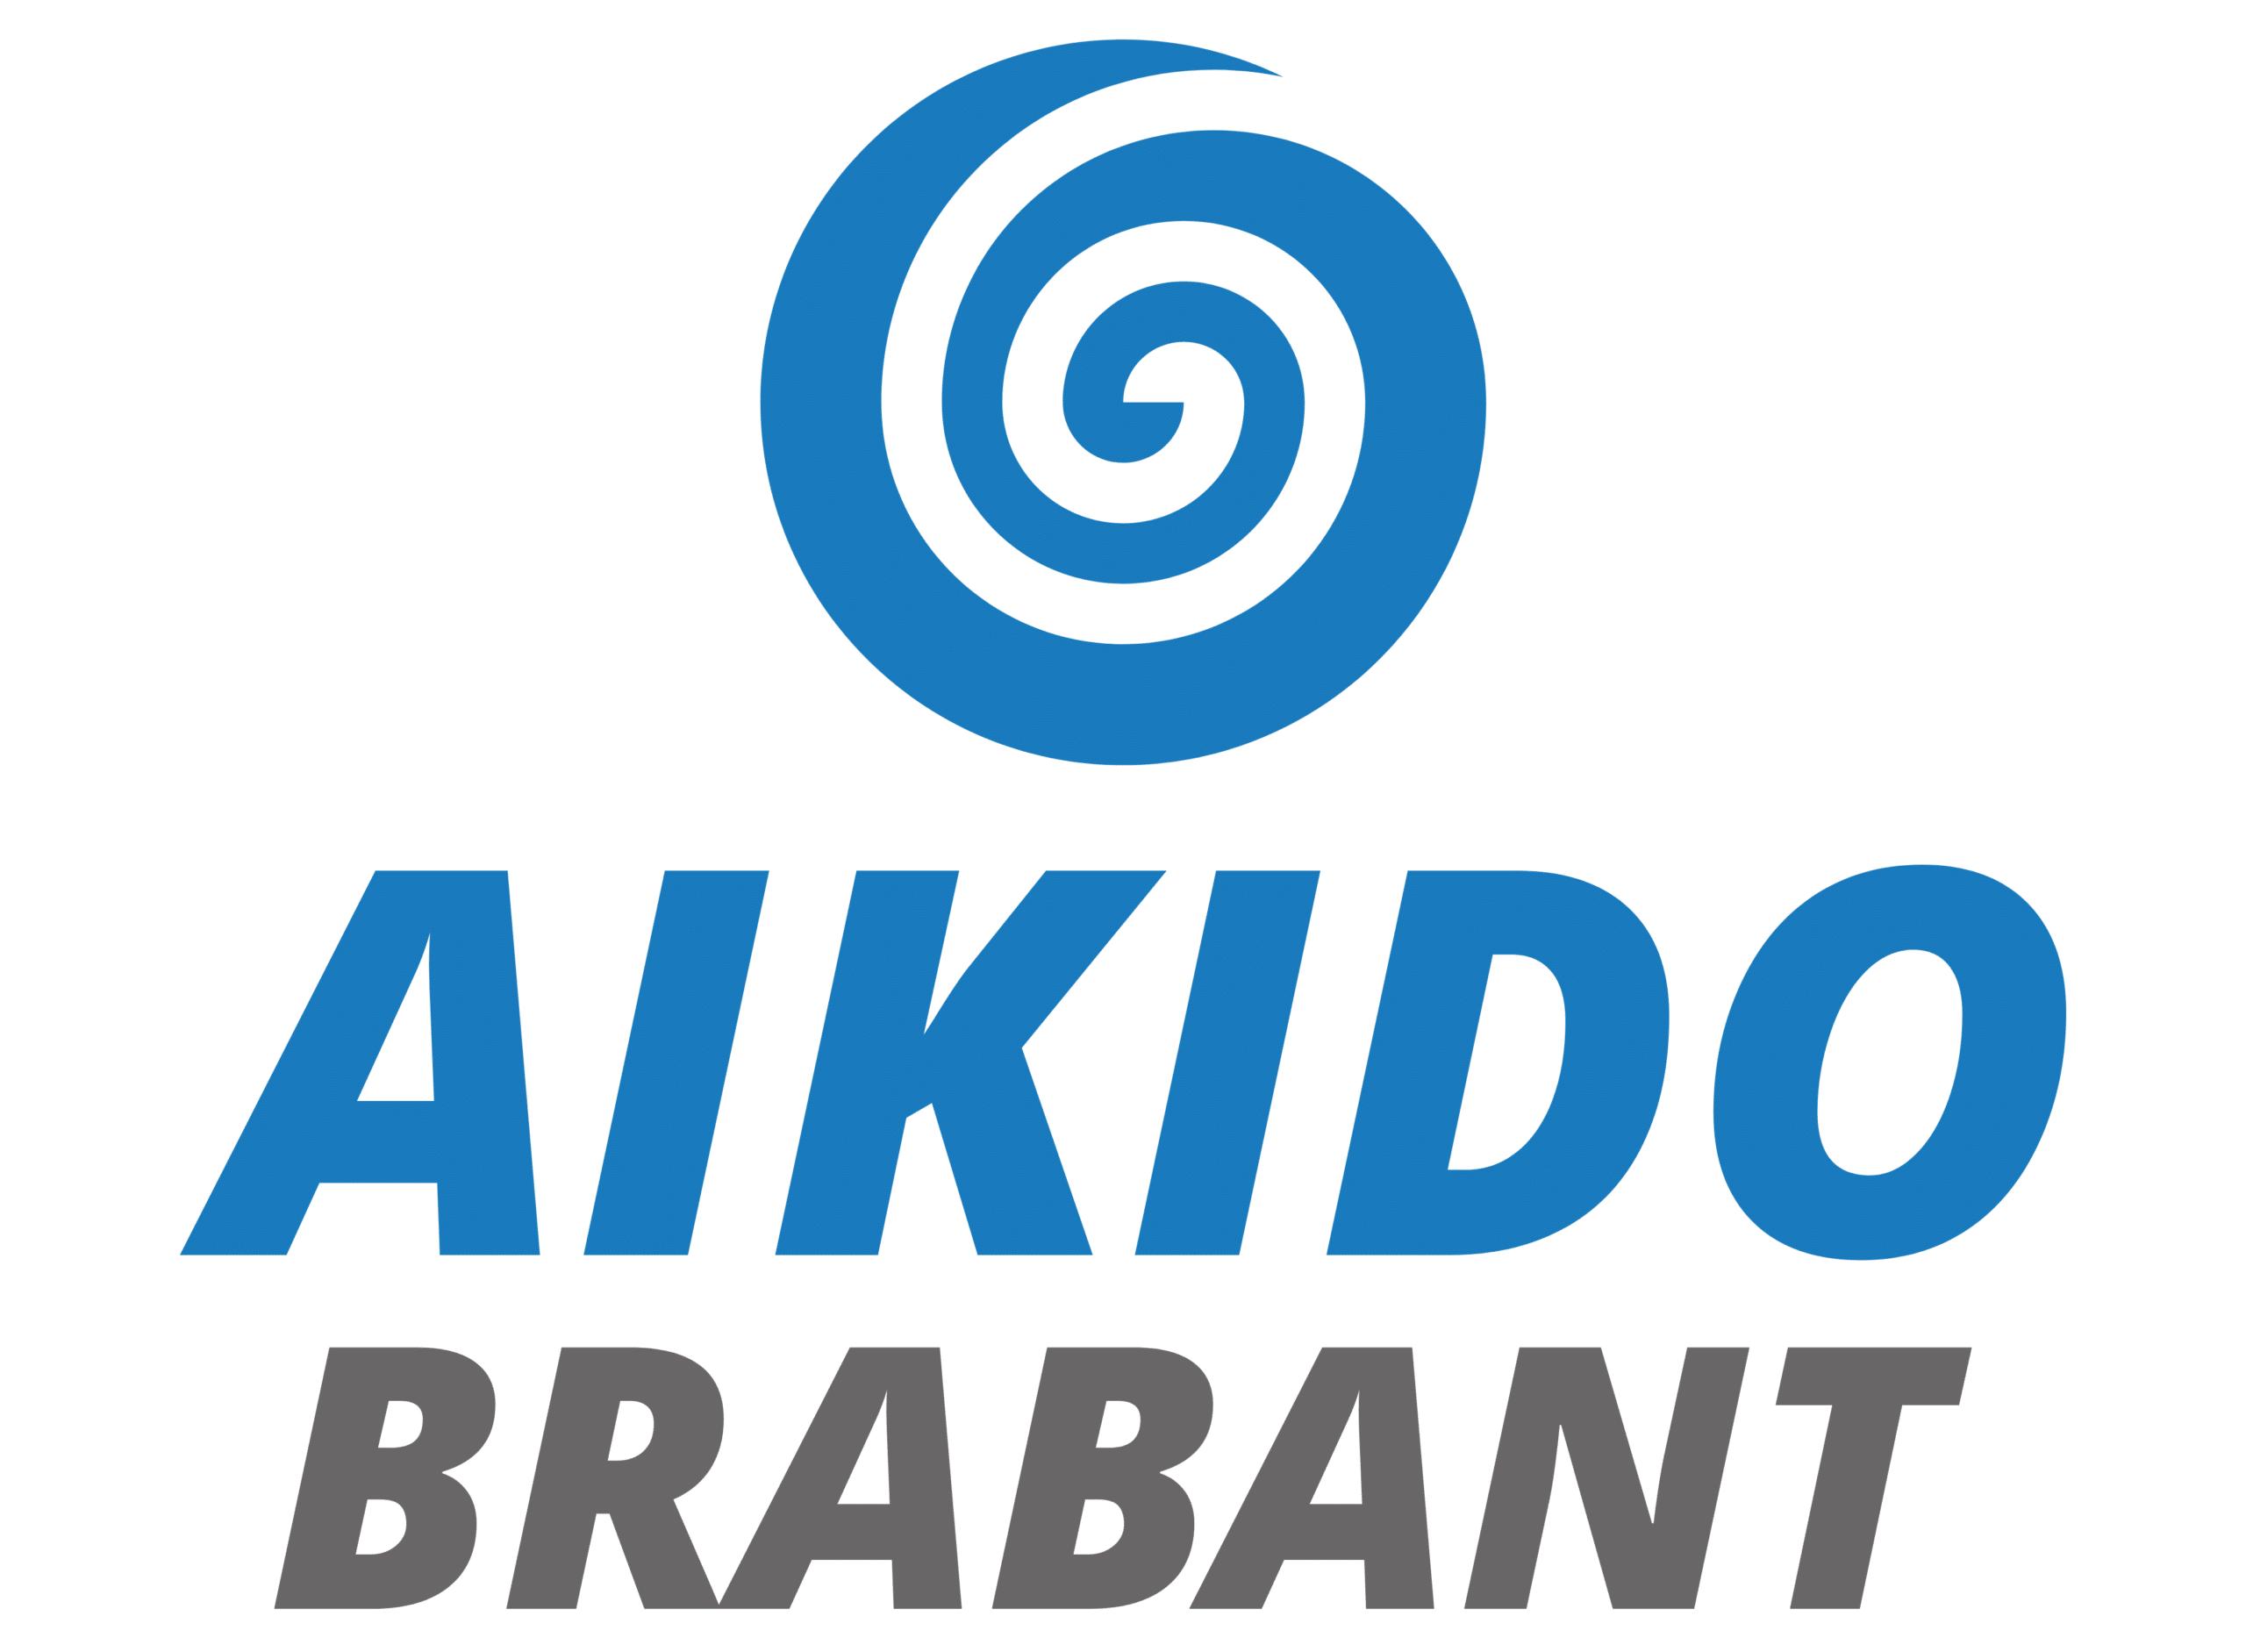 Aikido Brabant